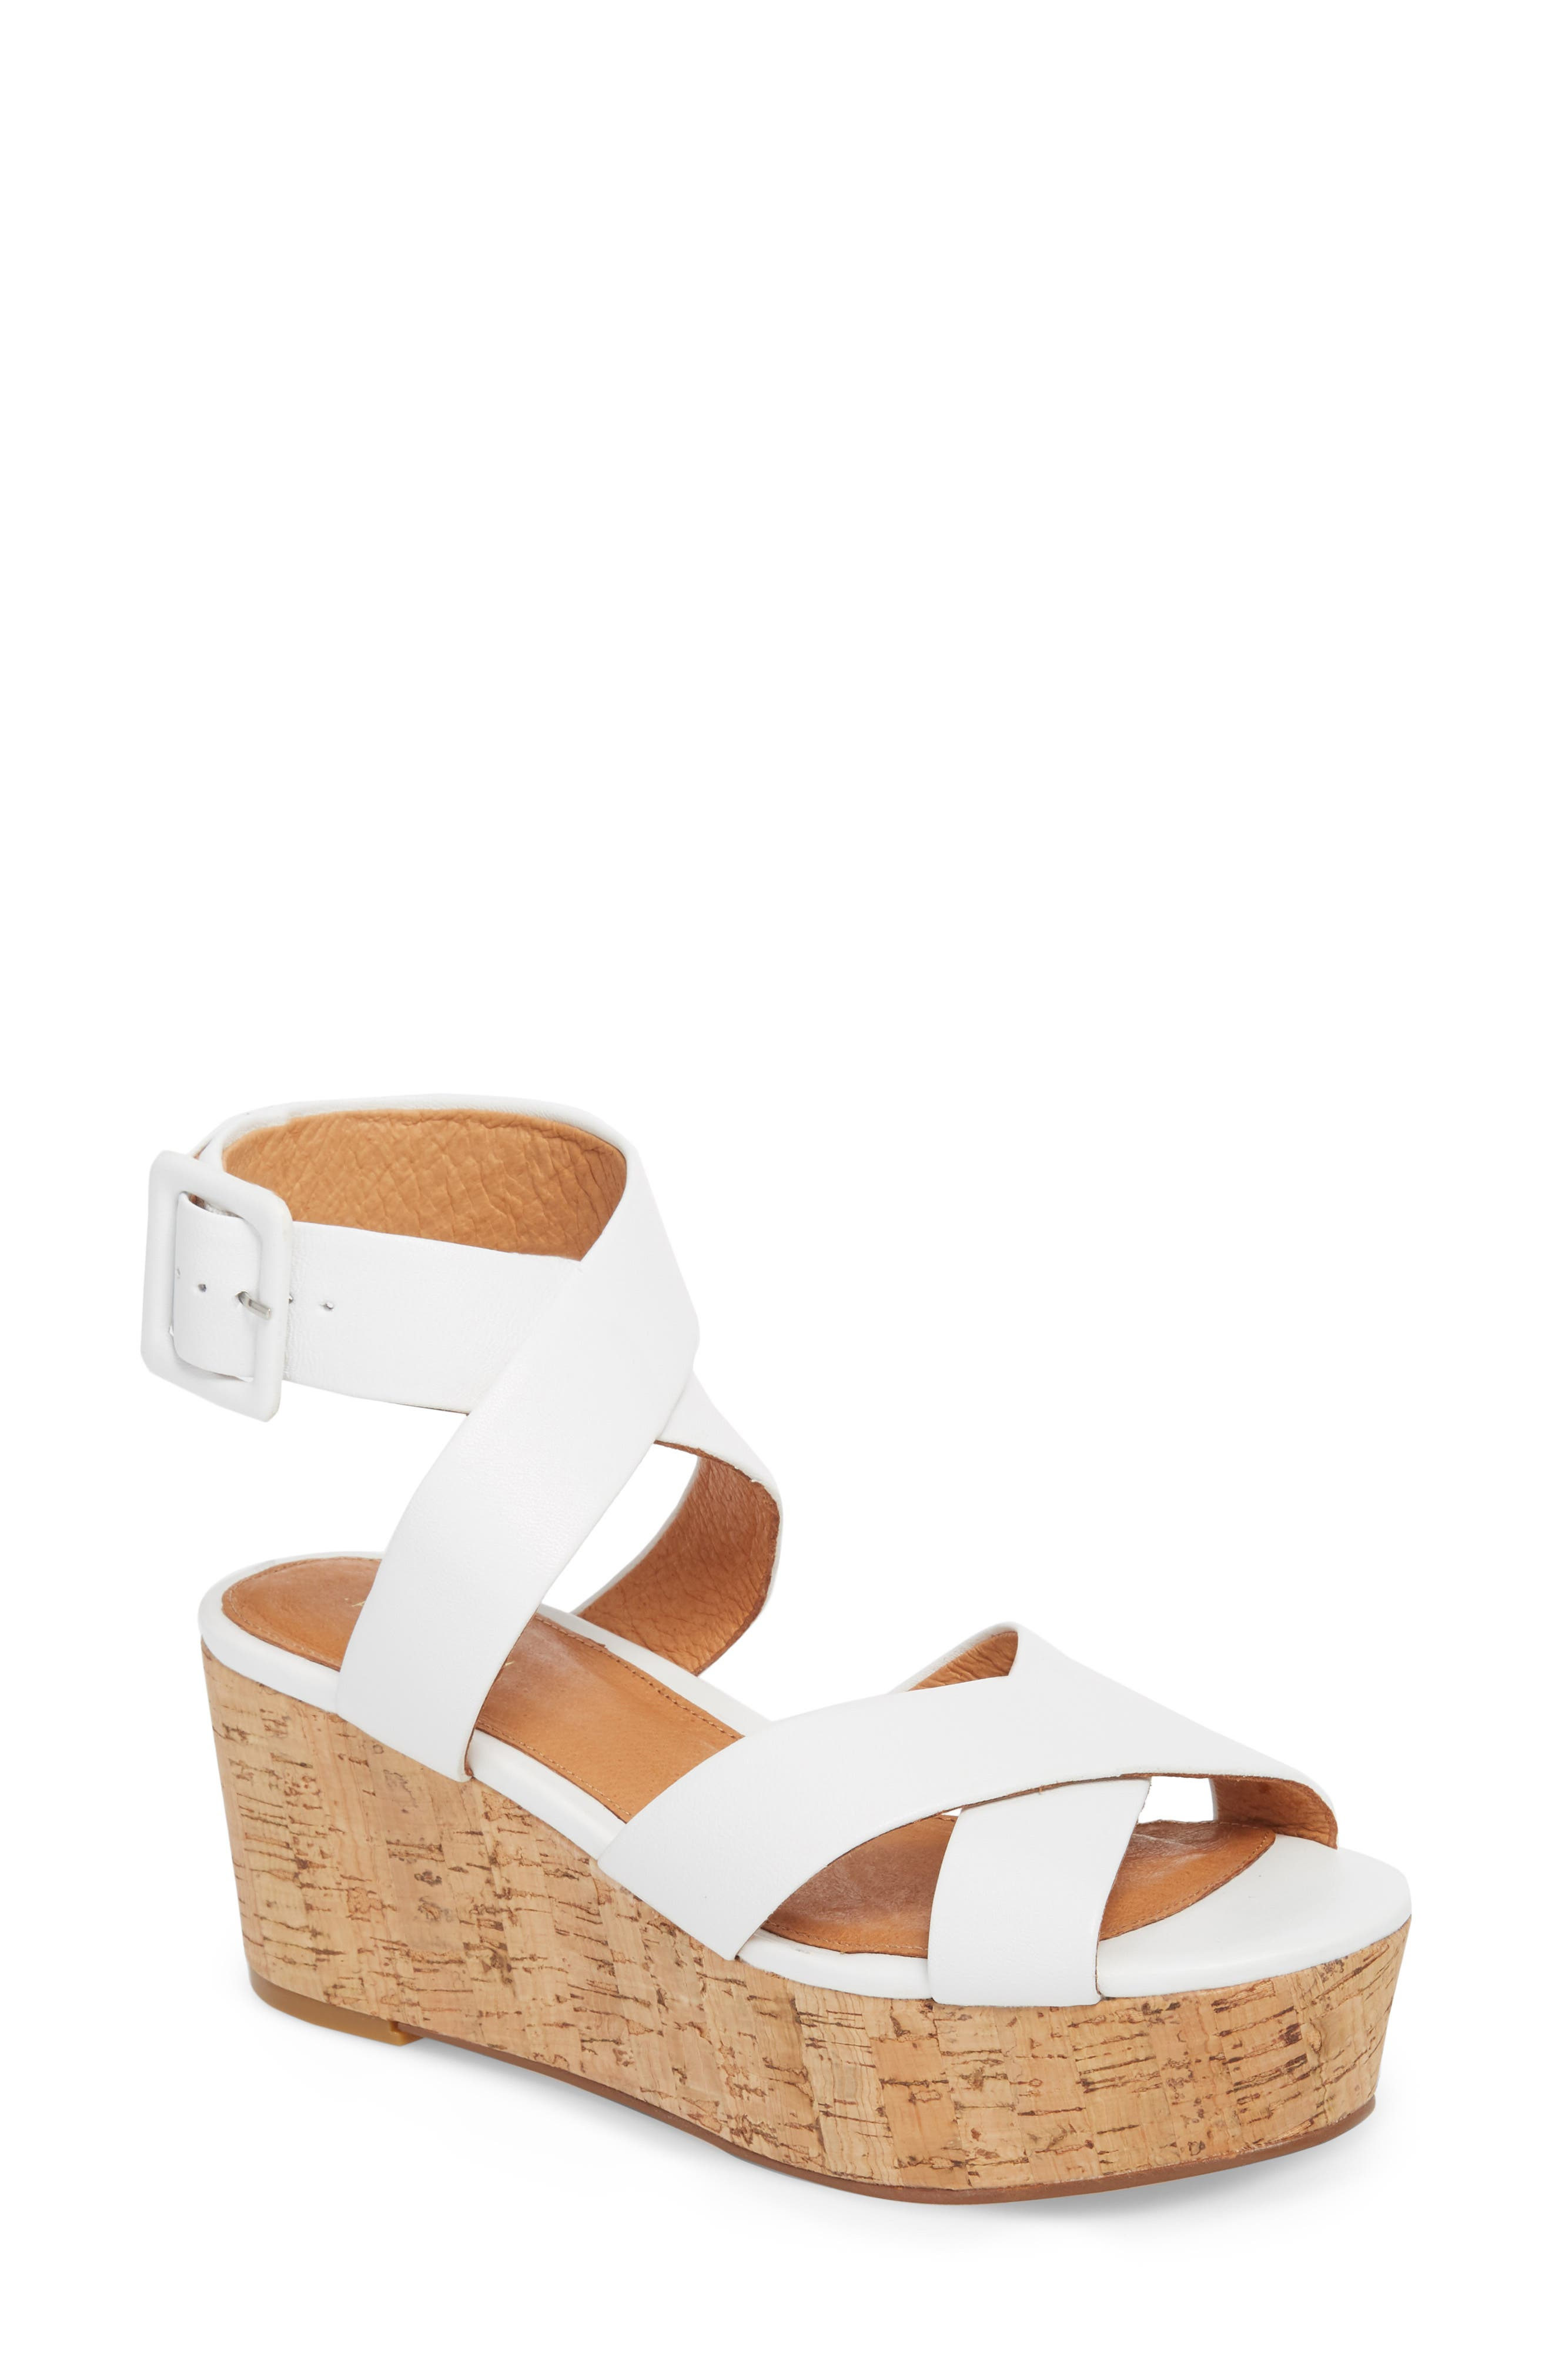 Evie Platform Wedge Sandal,                             Main thumbnail 2, color,